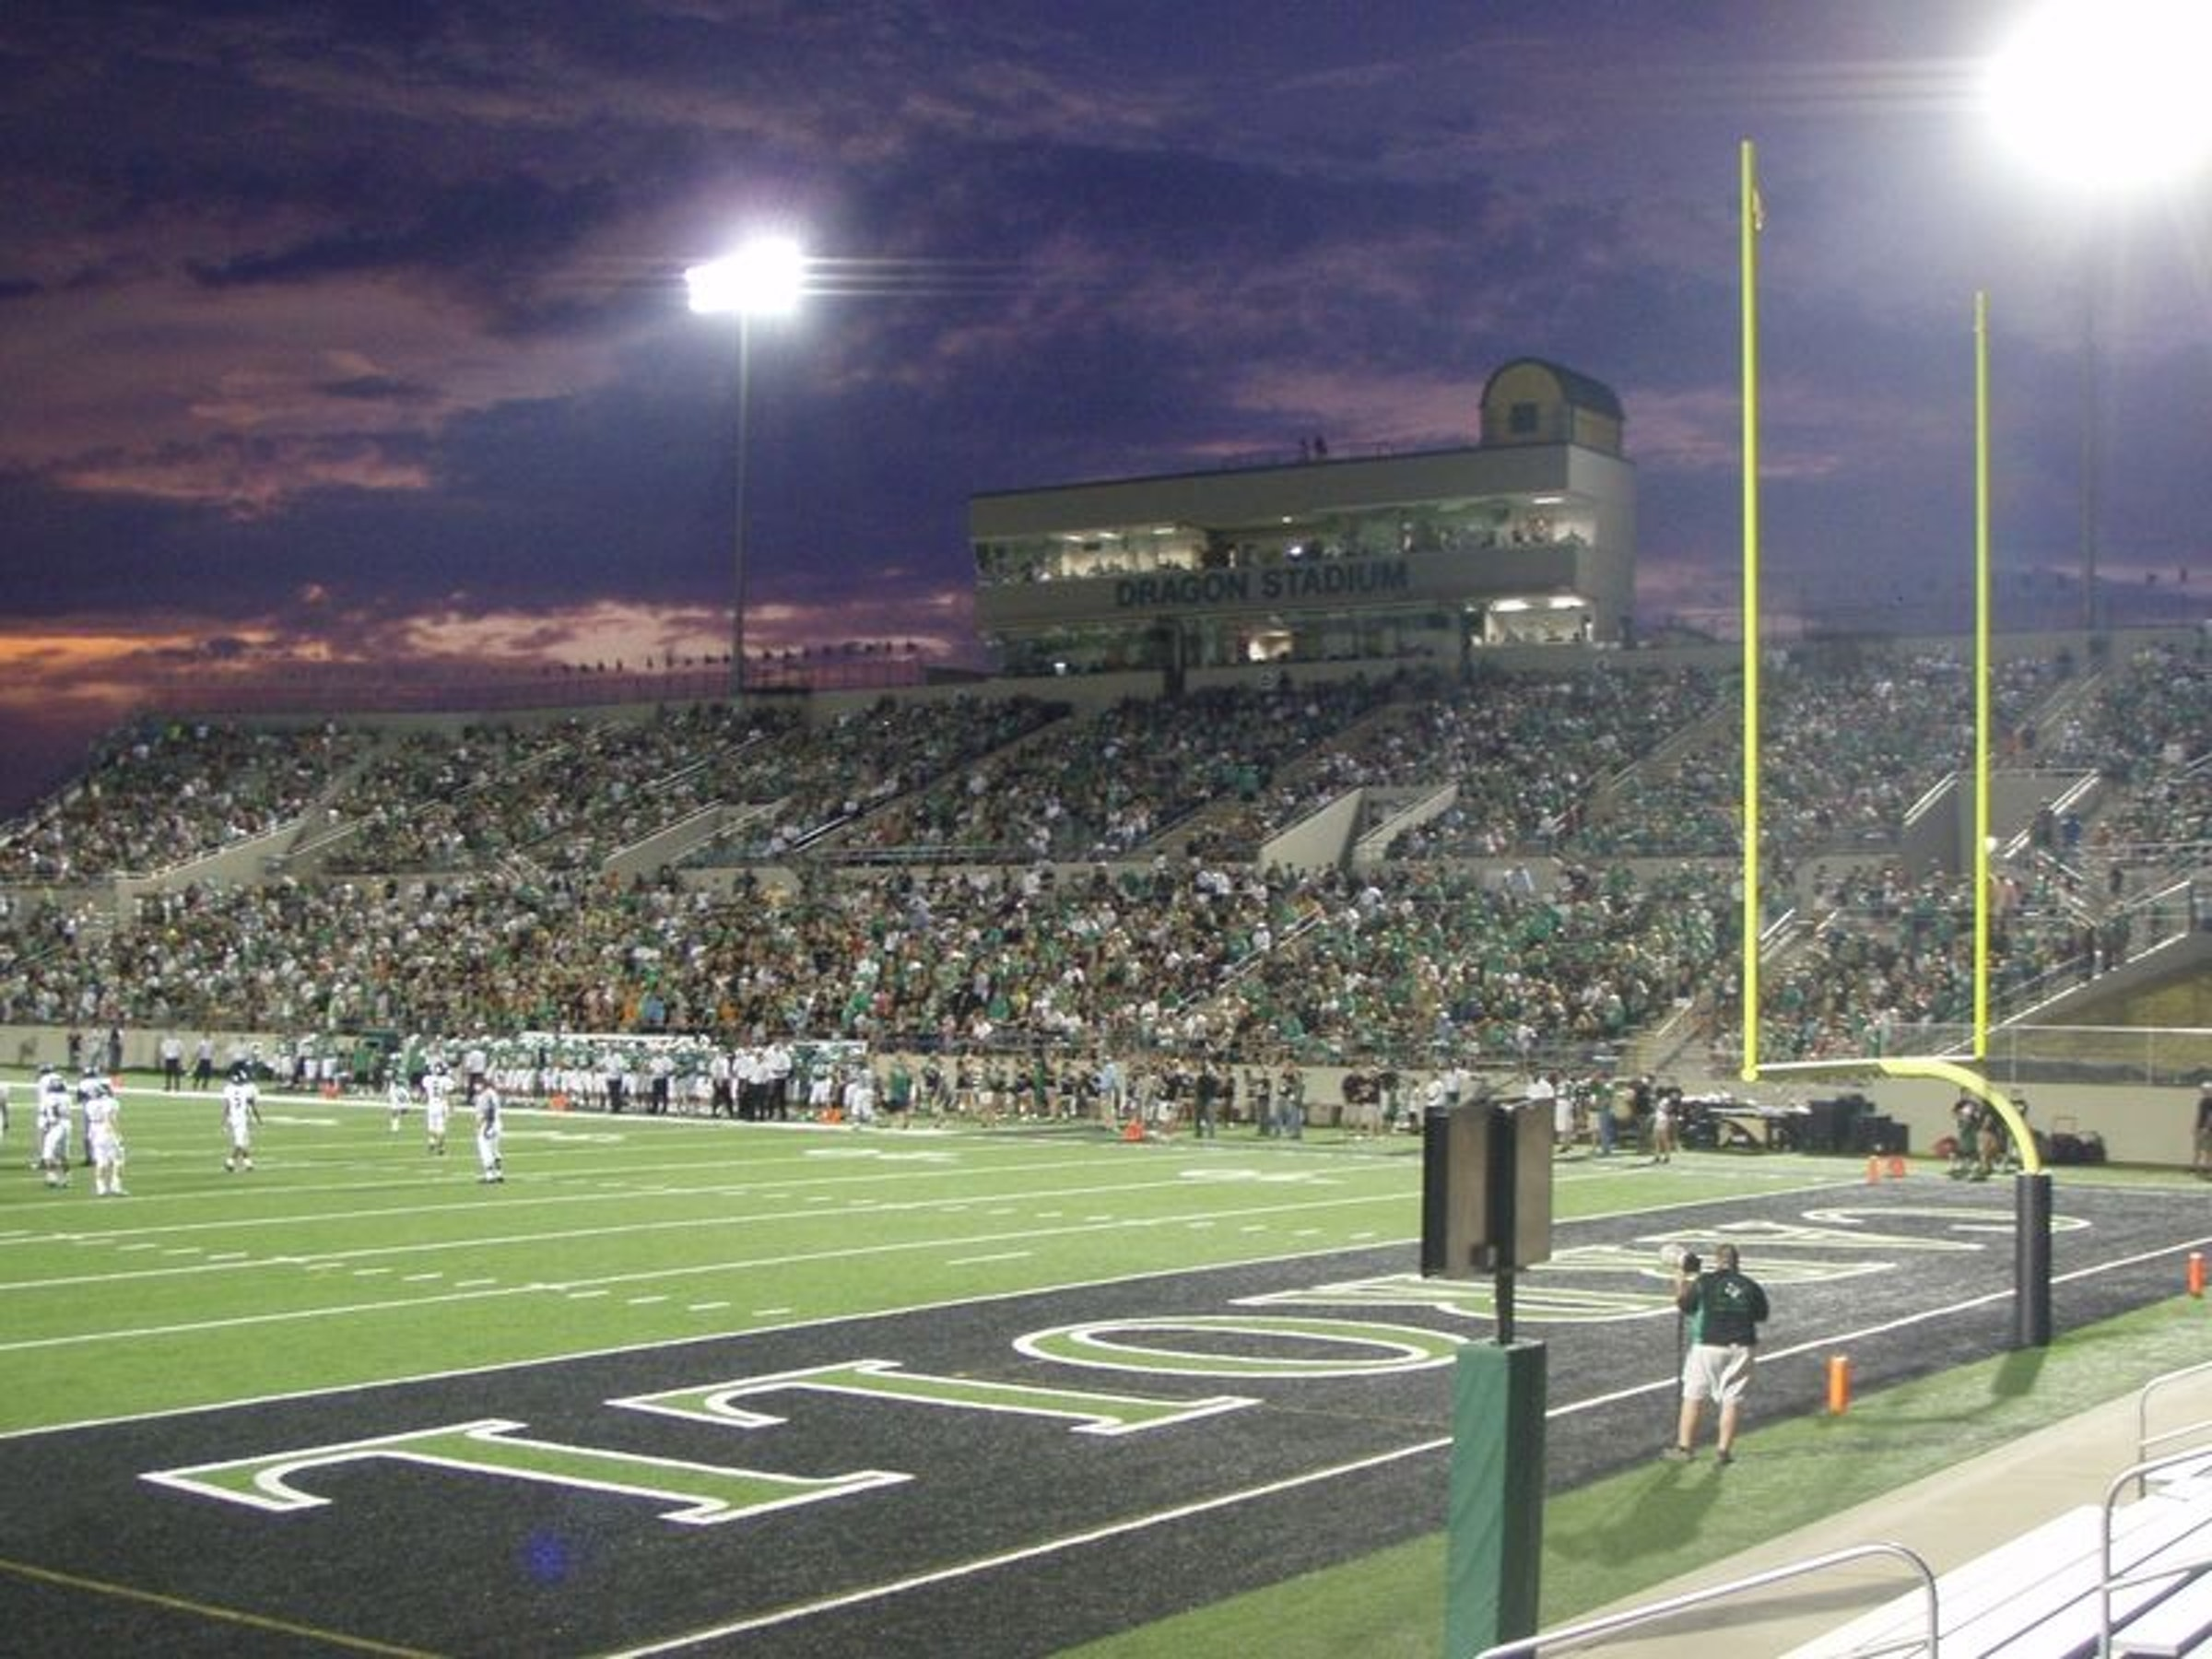 Dragon Stadium in Beyond Dallas